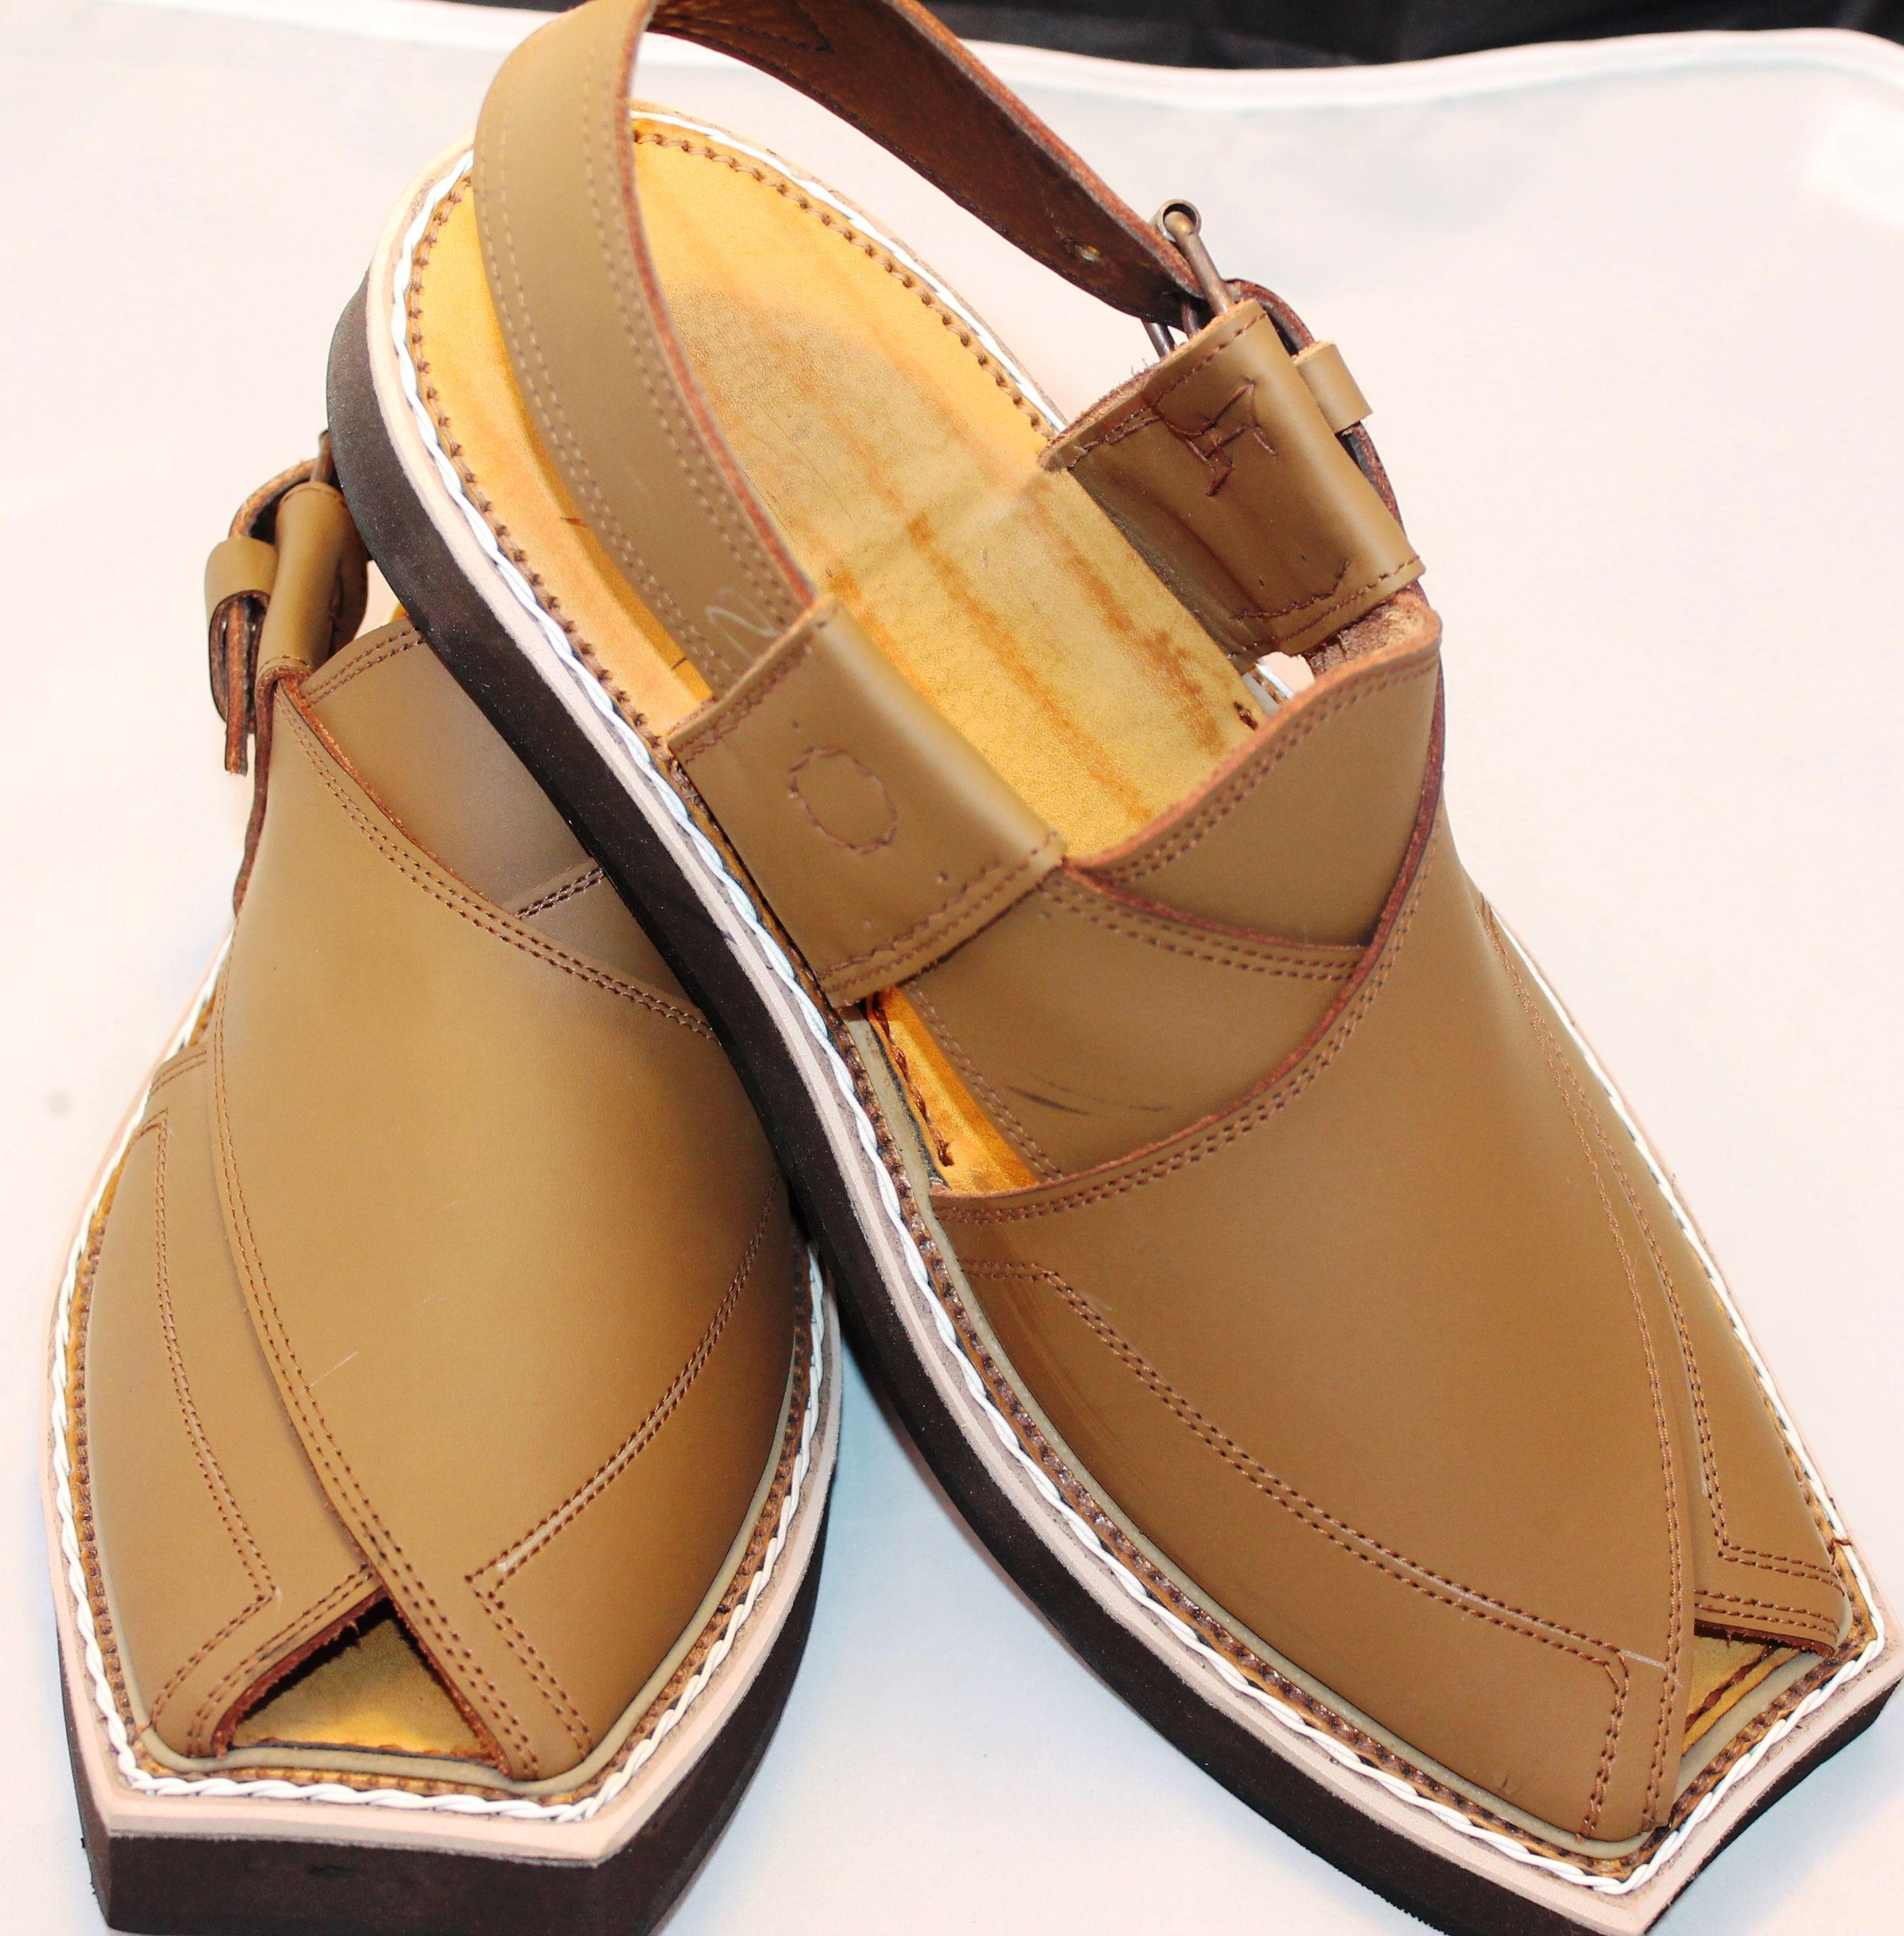 Imran Khan-Kaptan chappal Pure//Original  LEATHER Sandals Handmade from Pakistan